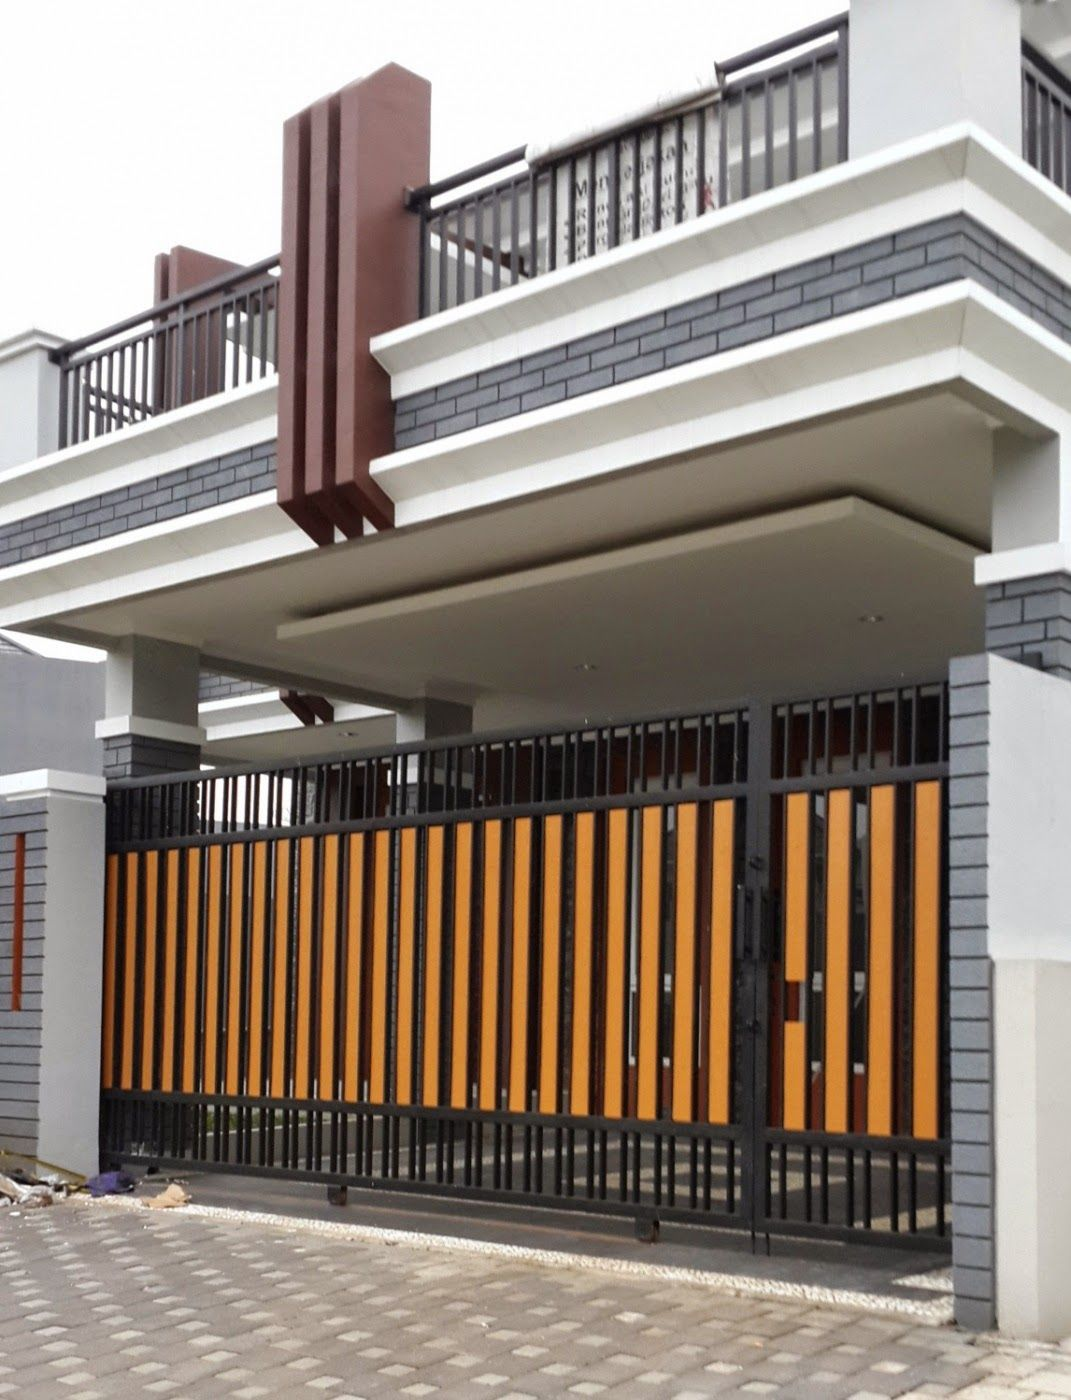 Pagar Minimalis Modern Terbaru Dan Terlengkap 2015 | Eksterior Modern,  Arsitektur, Minimalis